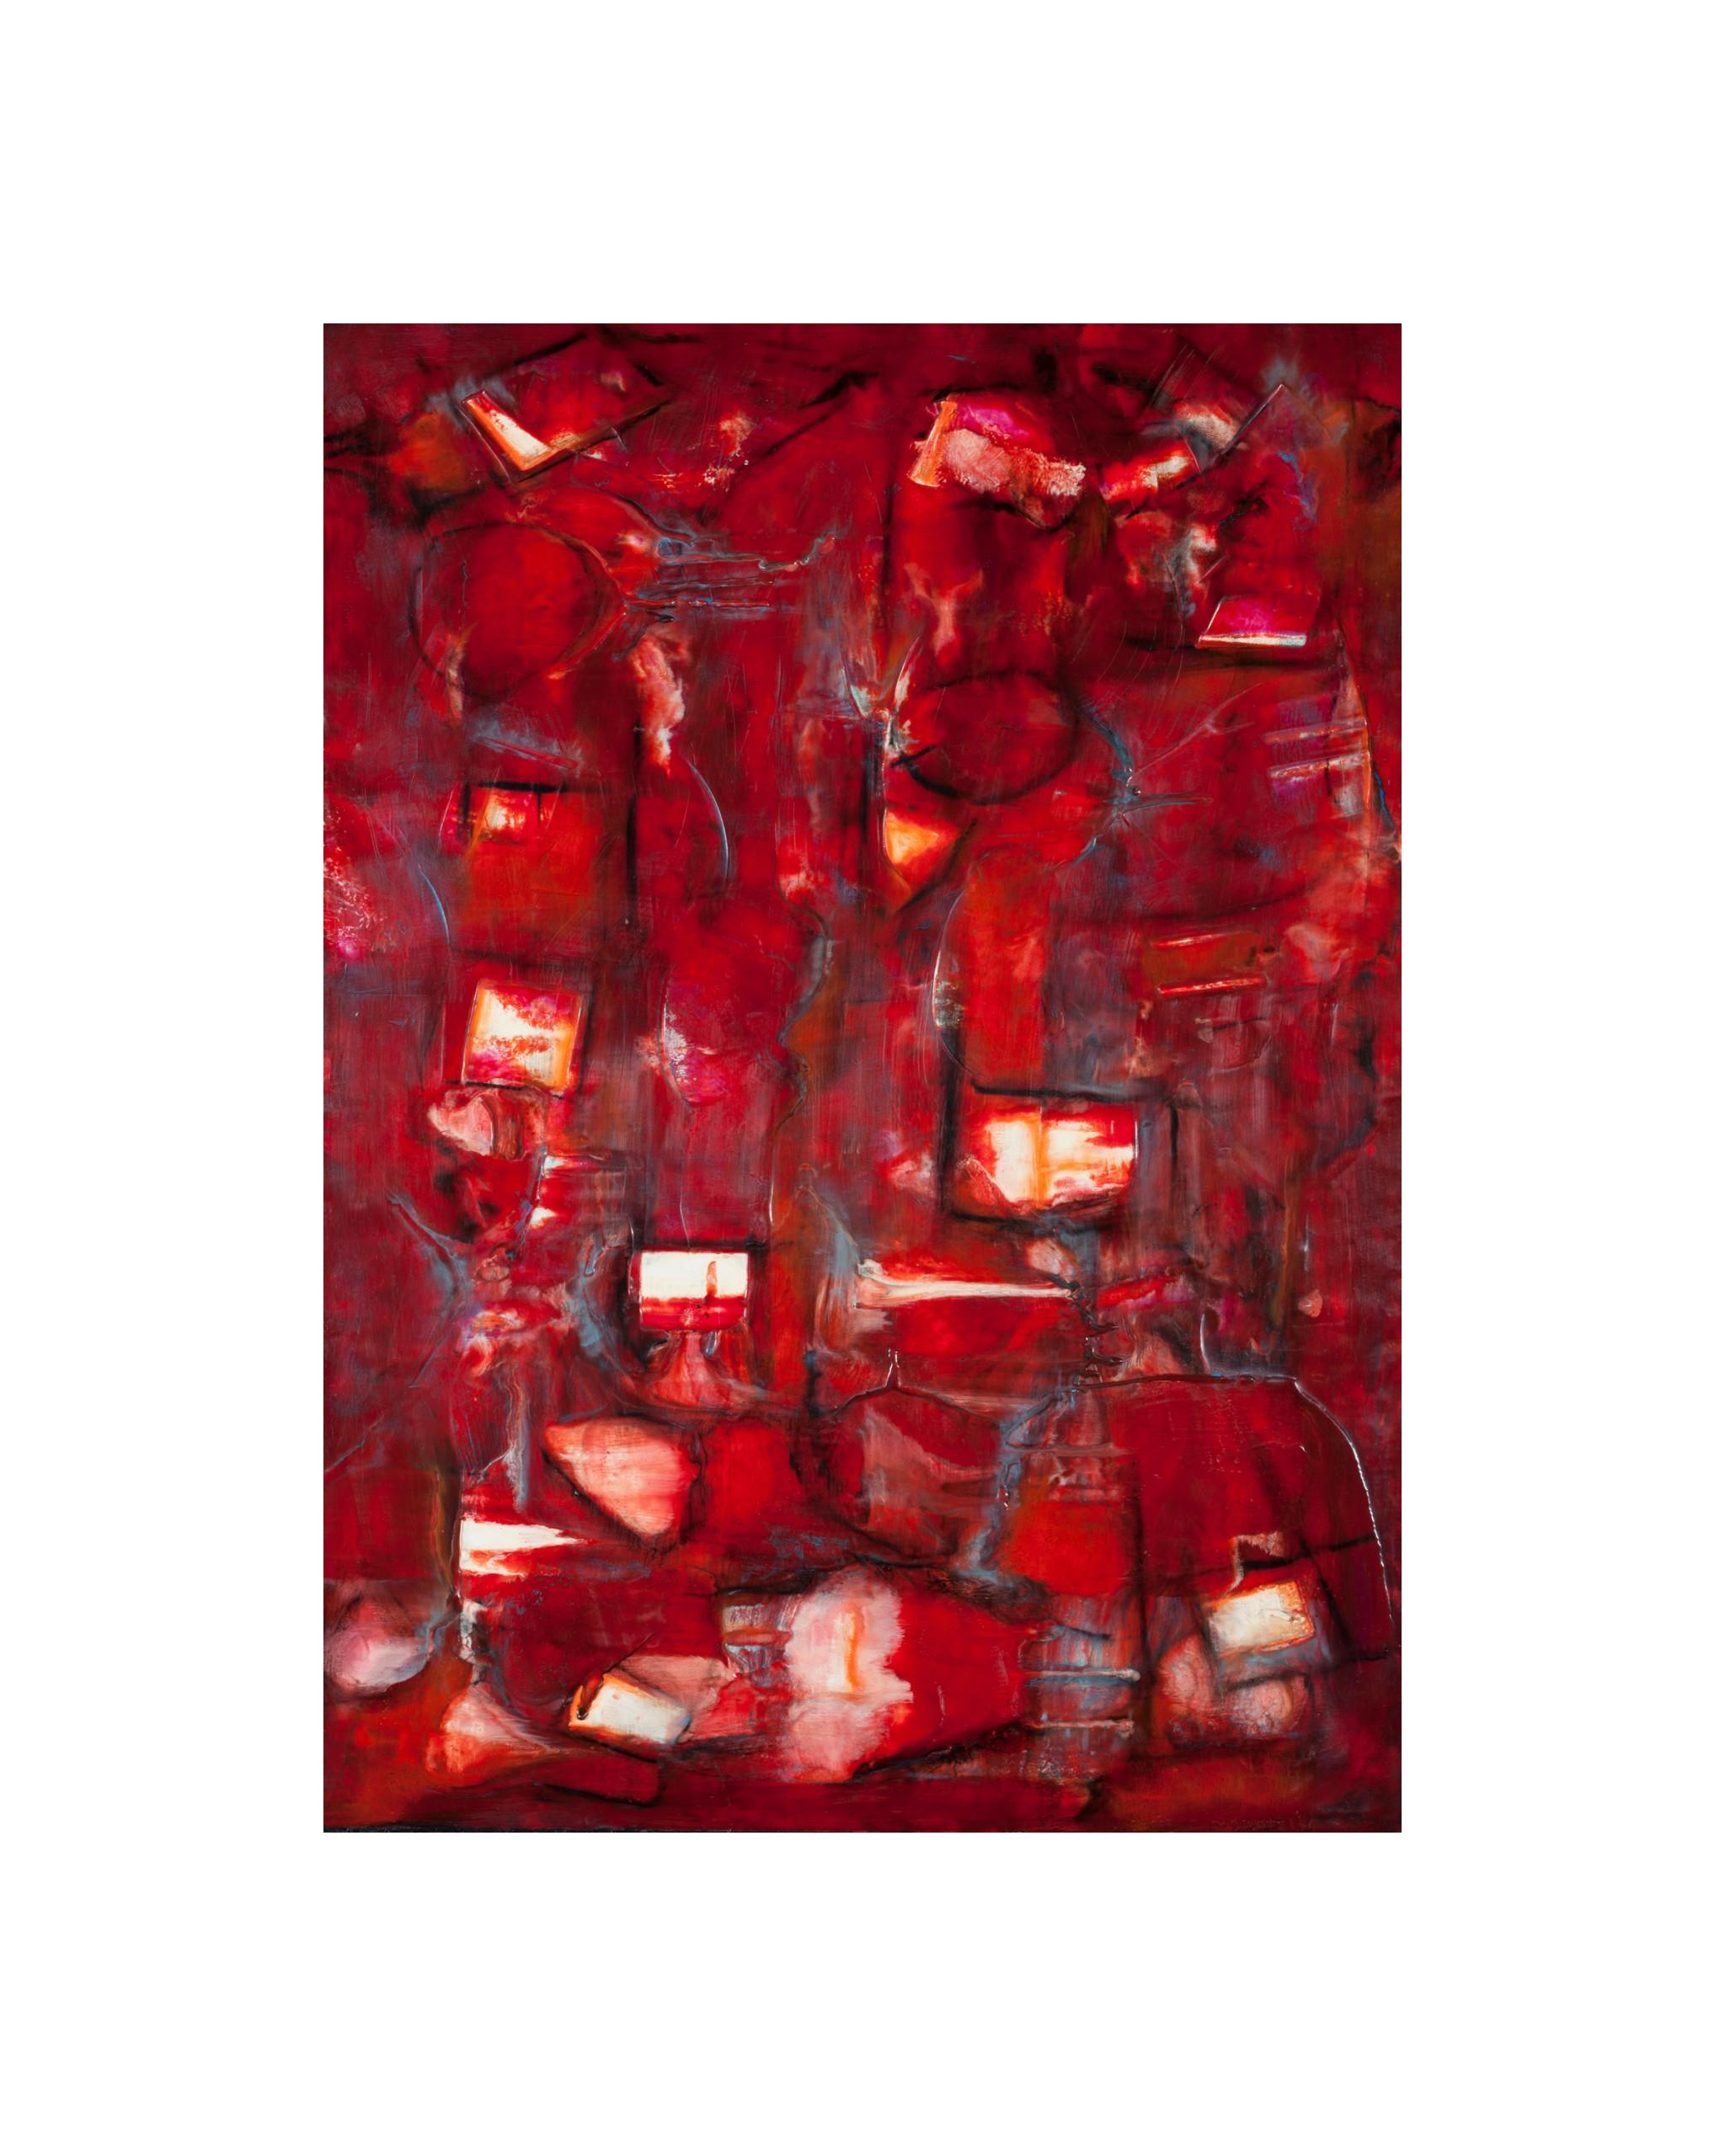 Passion, Encaustic on wooden panel, Framed 25.5